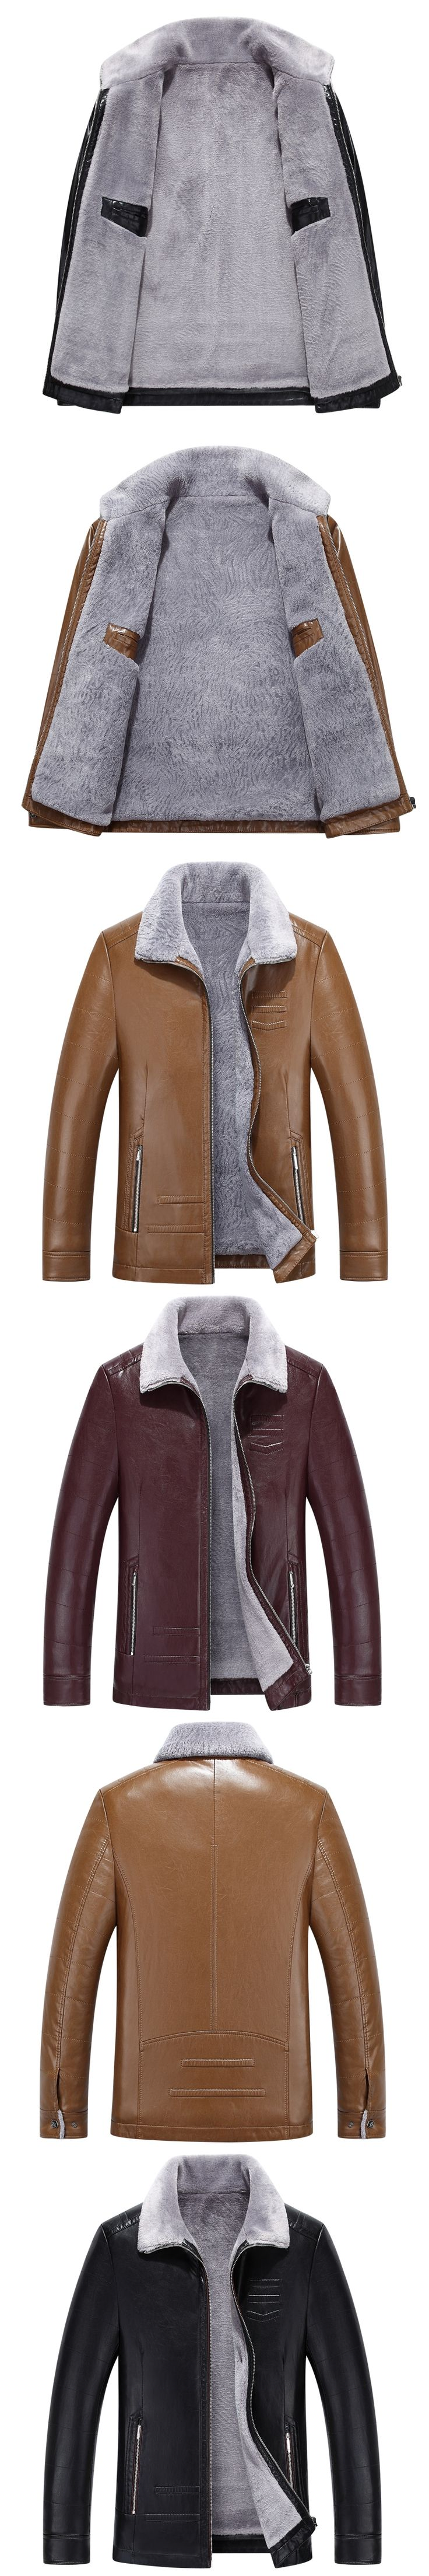 8719 New Fashion Men Clothing Sheepskin Sheepskin Leather Coat Man Winter Lamb Fur Coat  Man Winter Leather Jacket